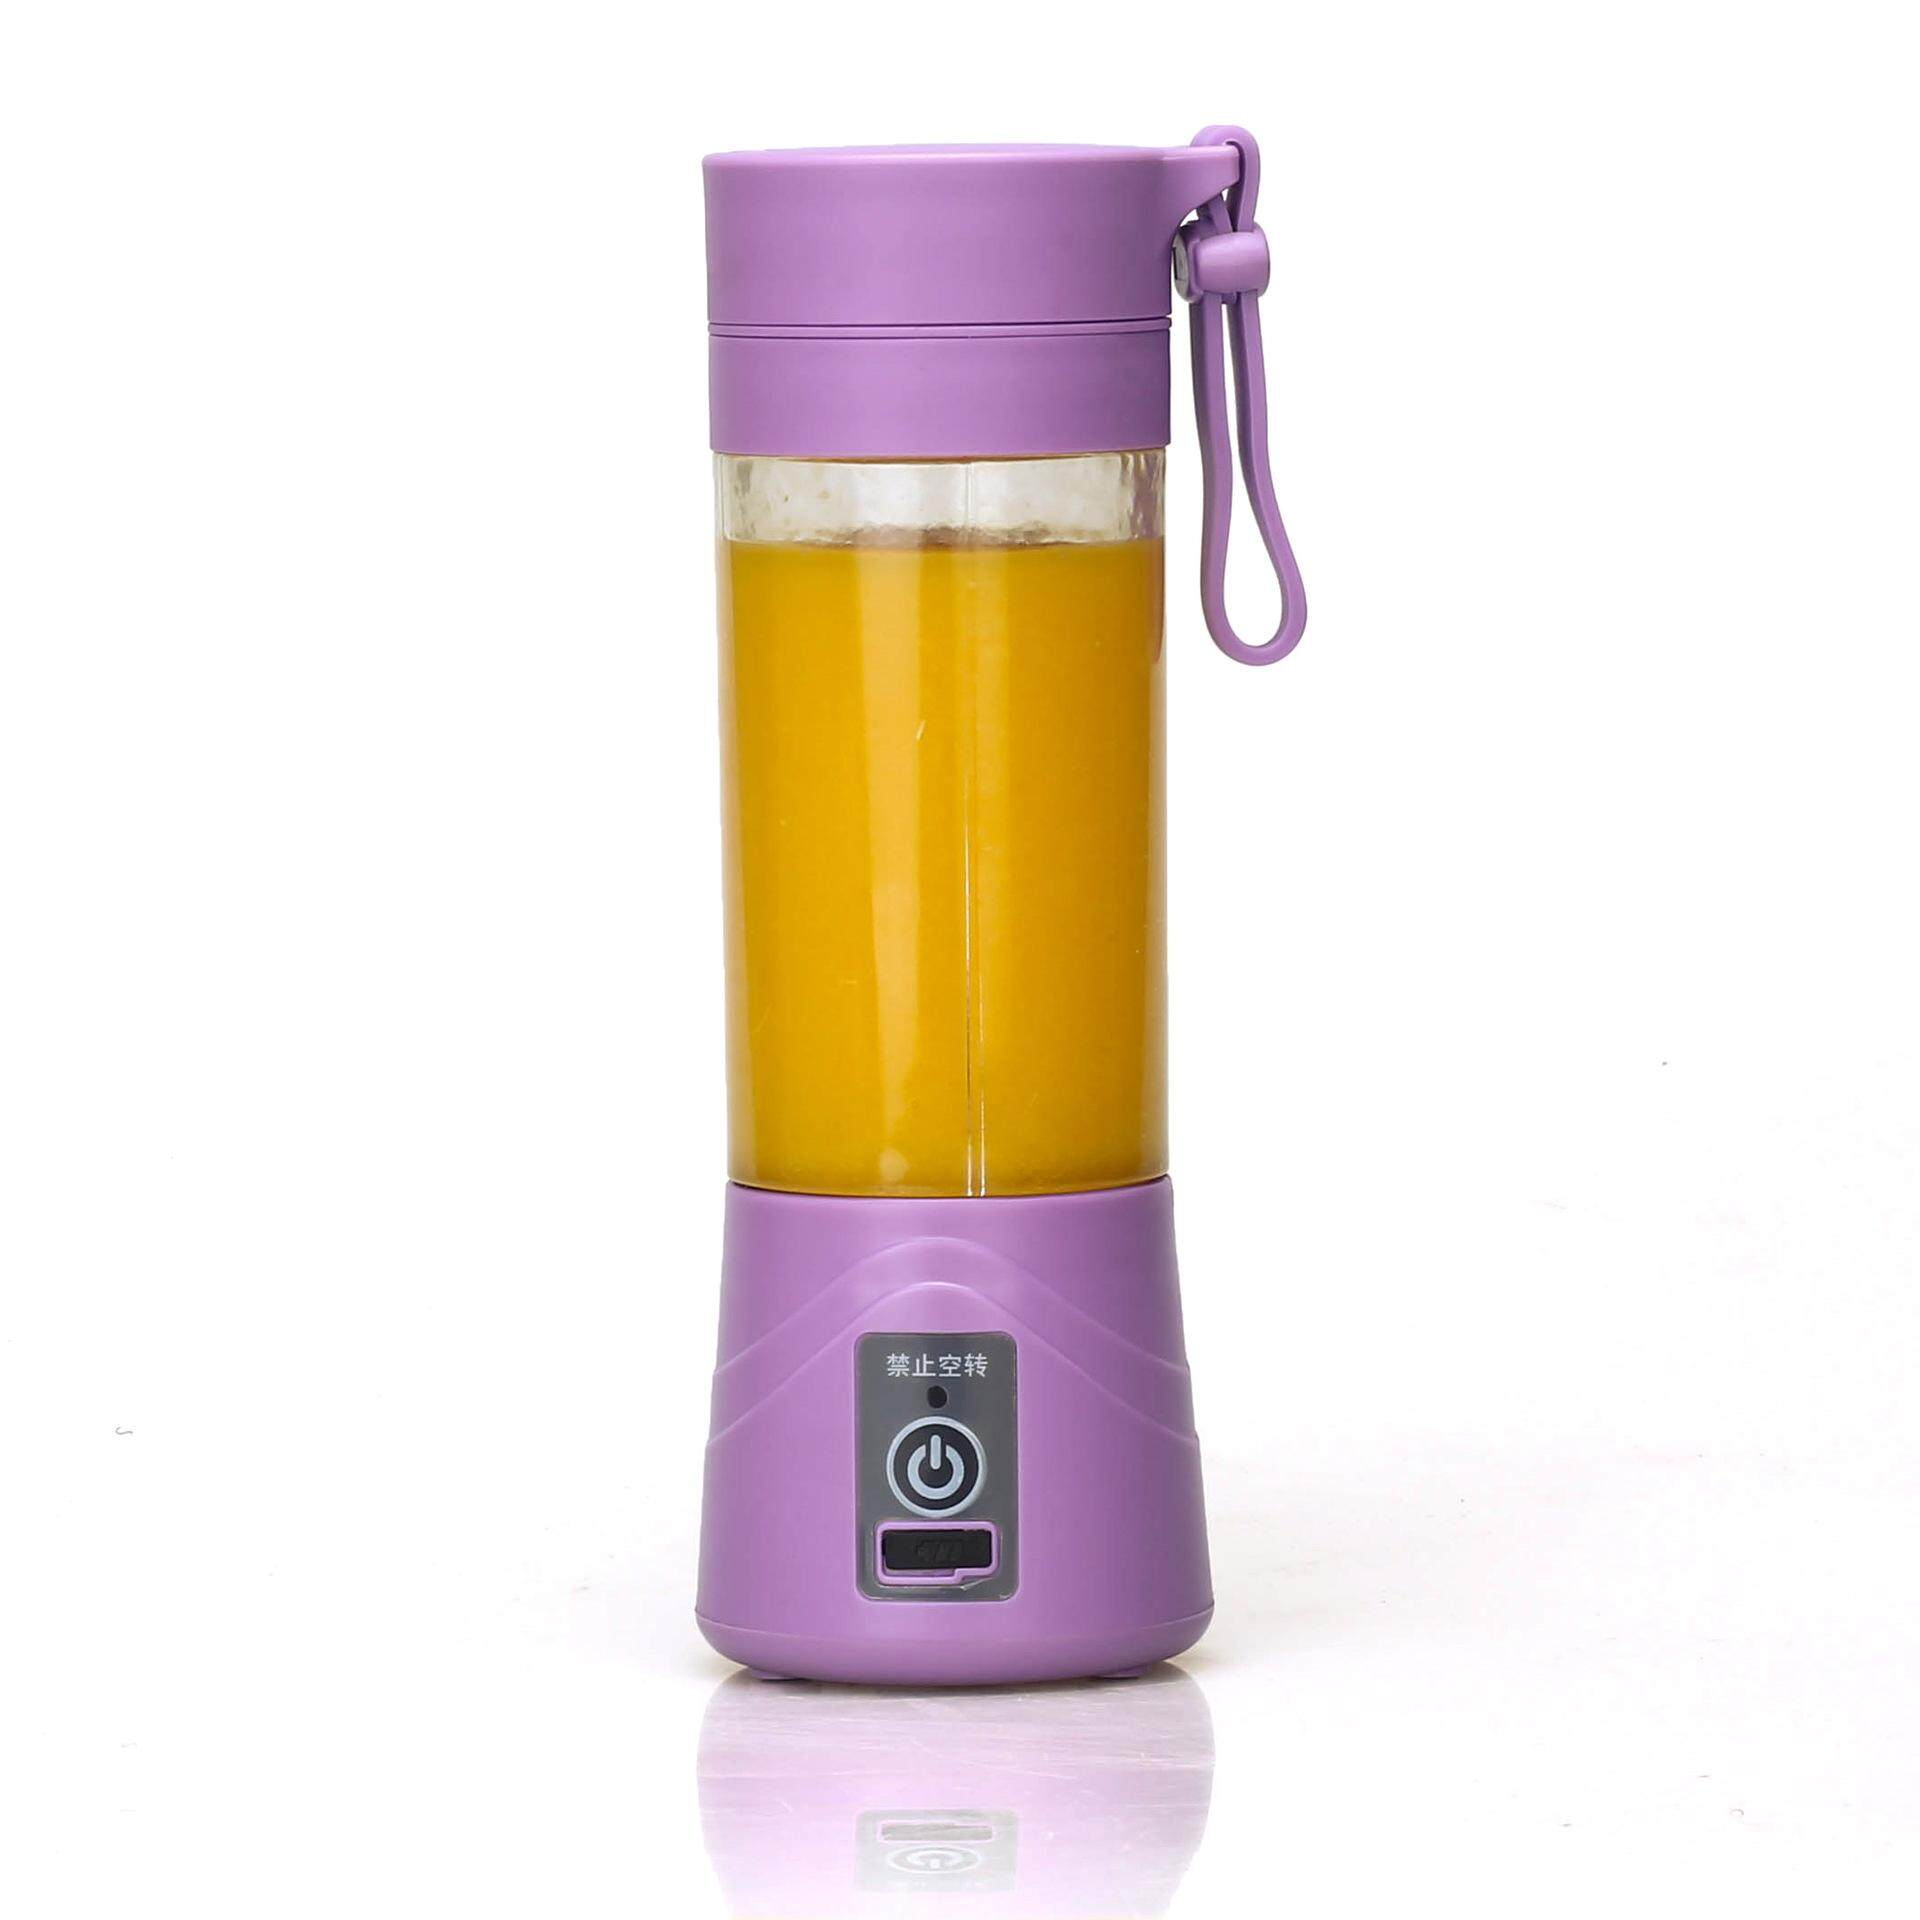 Realeos USB Chargeable Shake N Take Juice Blender – R399